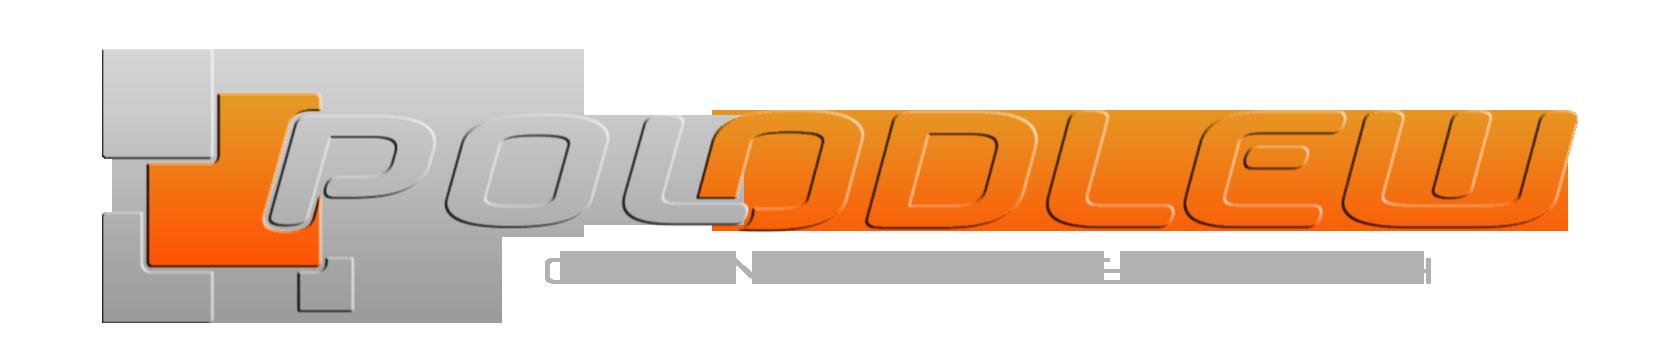 odlewnia metali - logo